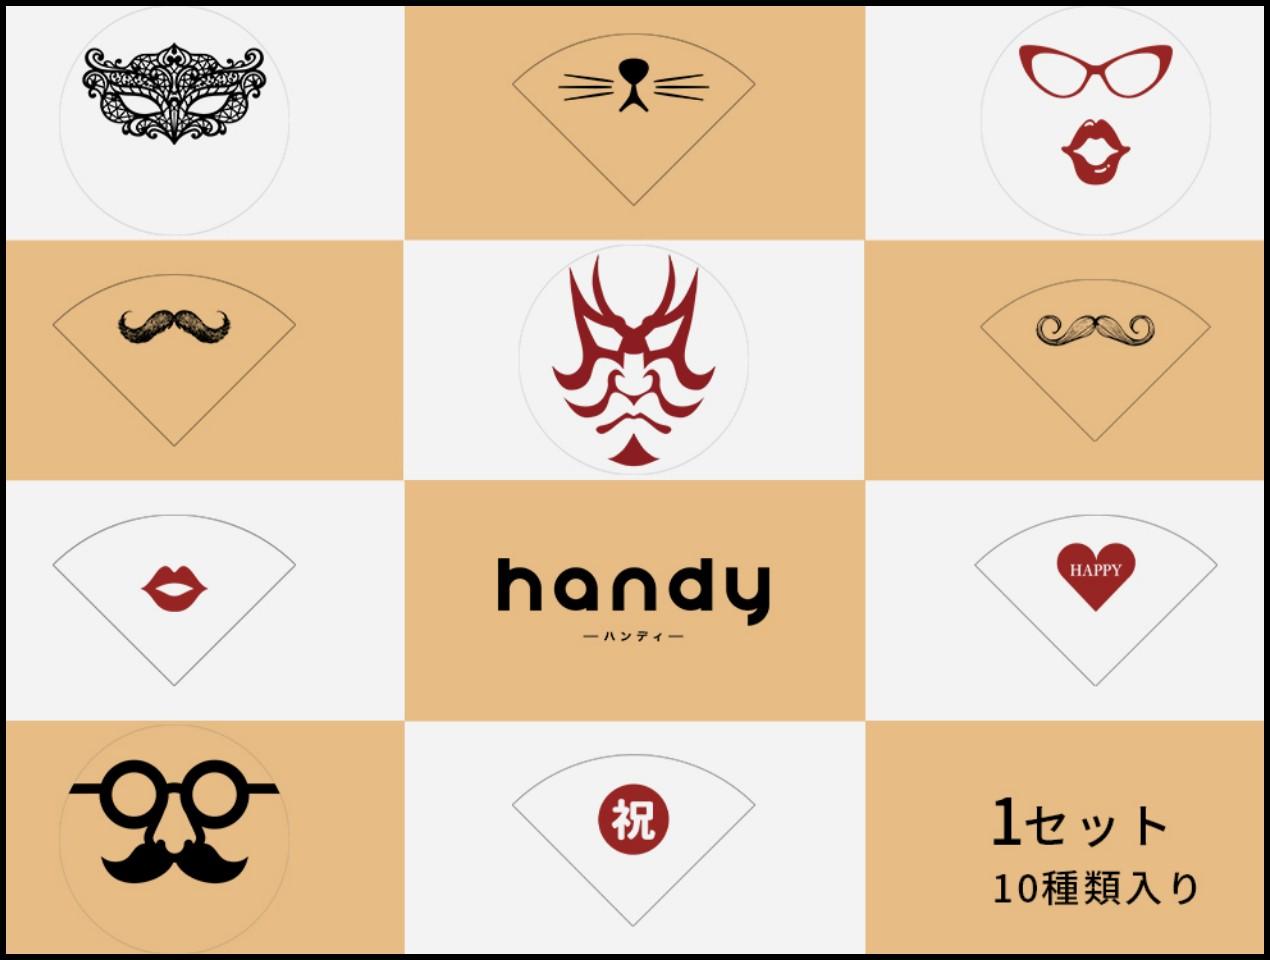 【handy】 - 手持ちタイプのおもしろシールド (10種入り) 飛沫感染対策商品